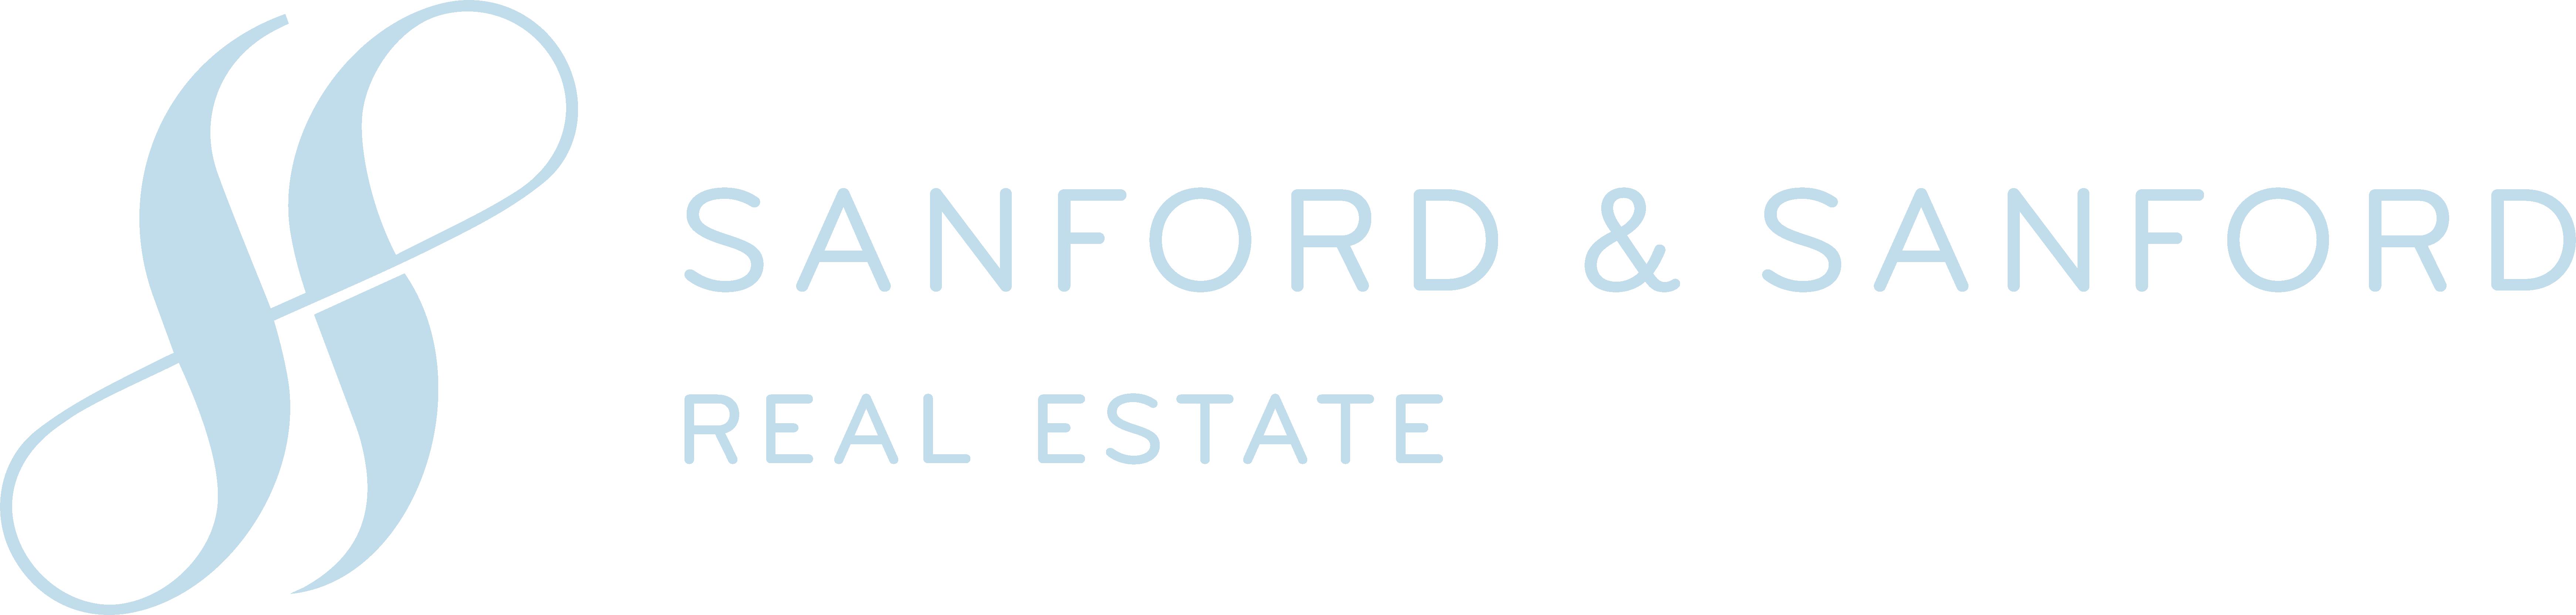 Nantucket vacation rentals and home sales - Sanford and Sanford Real Estate  Logo